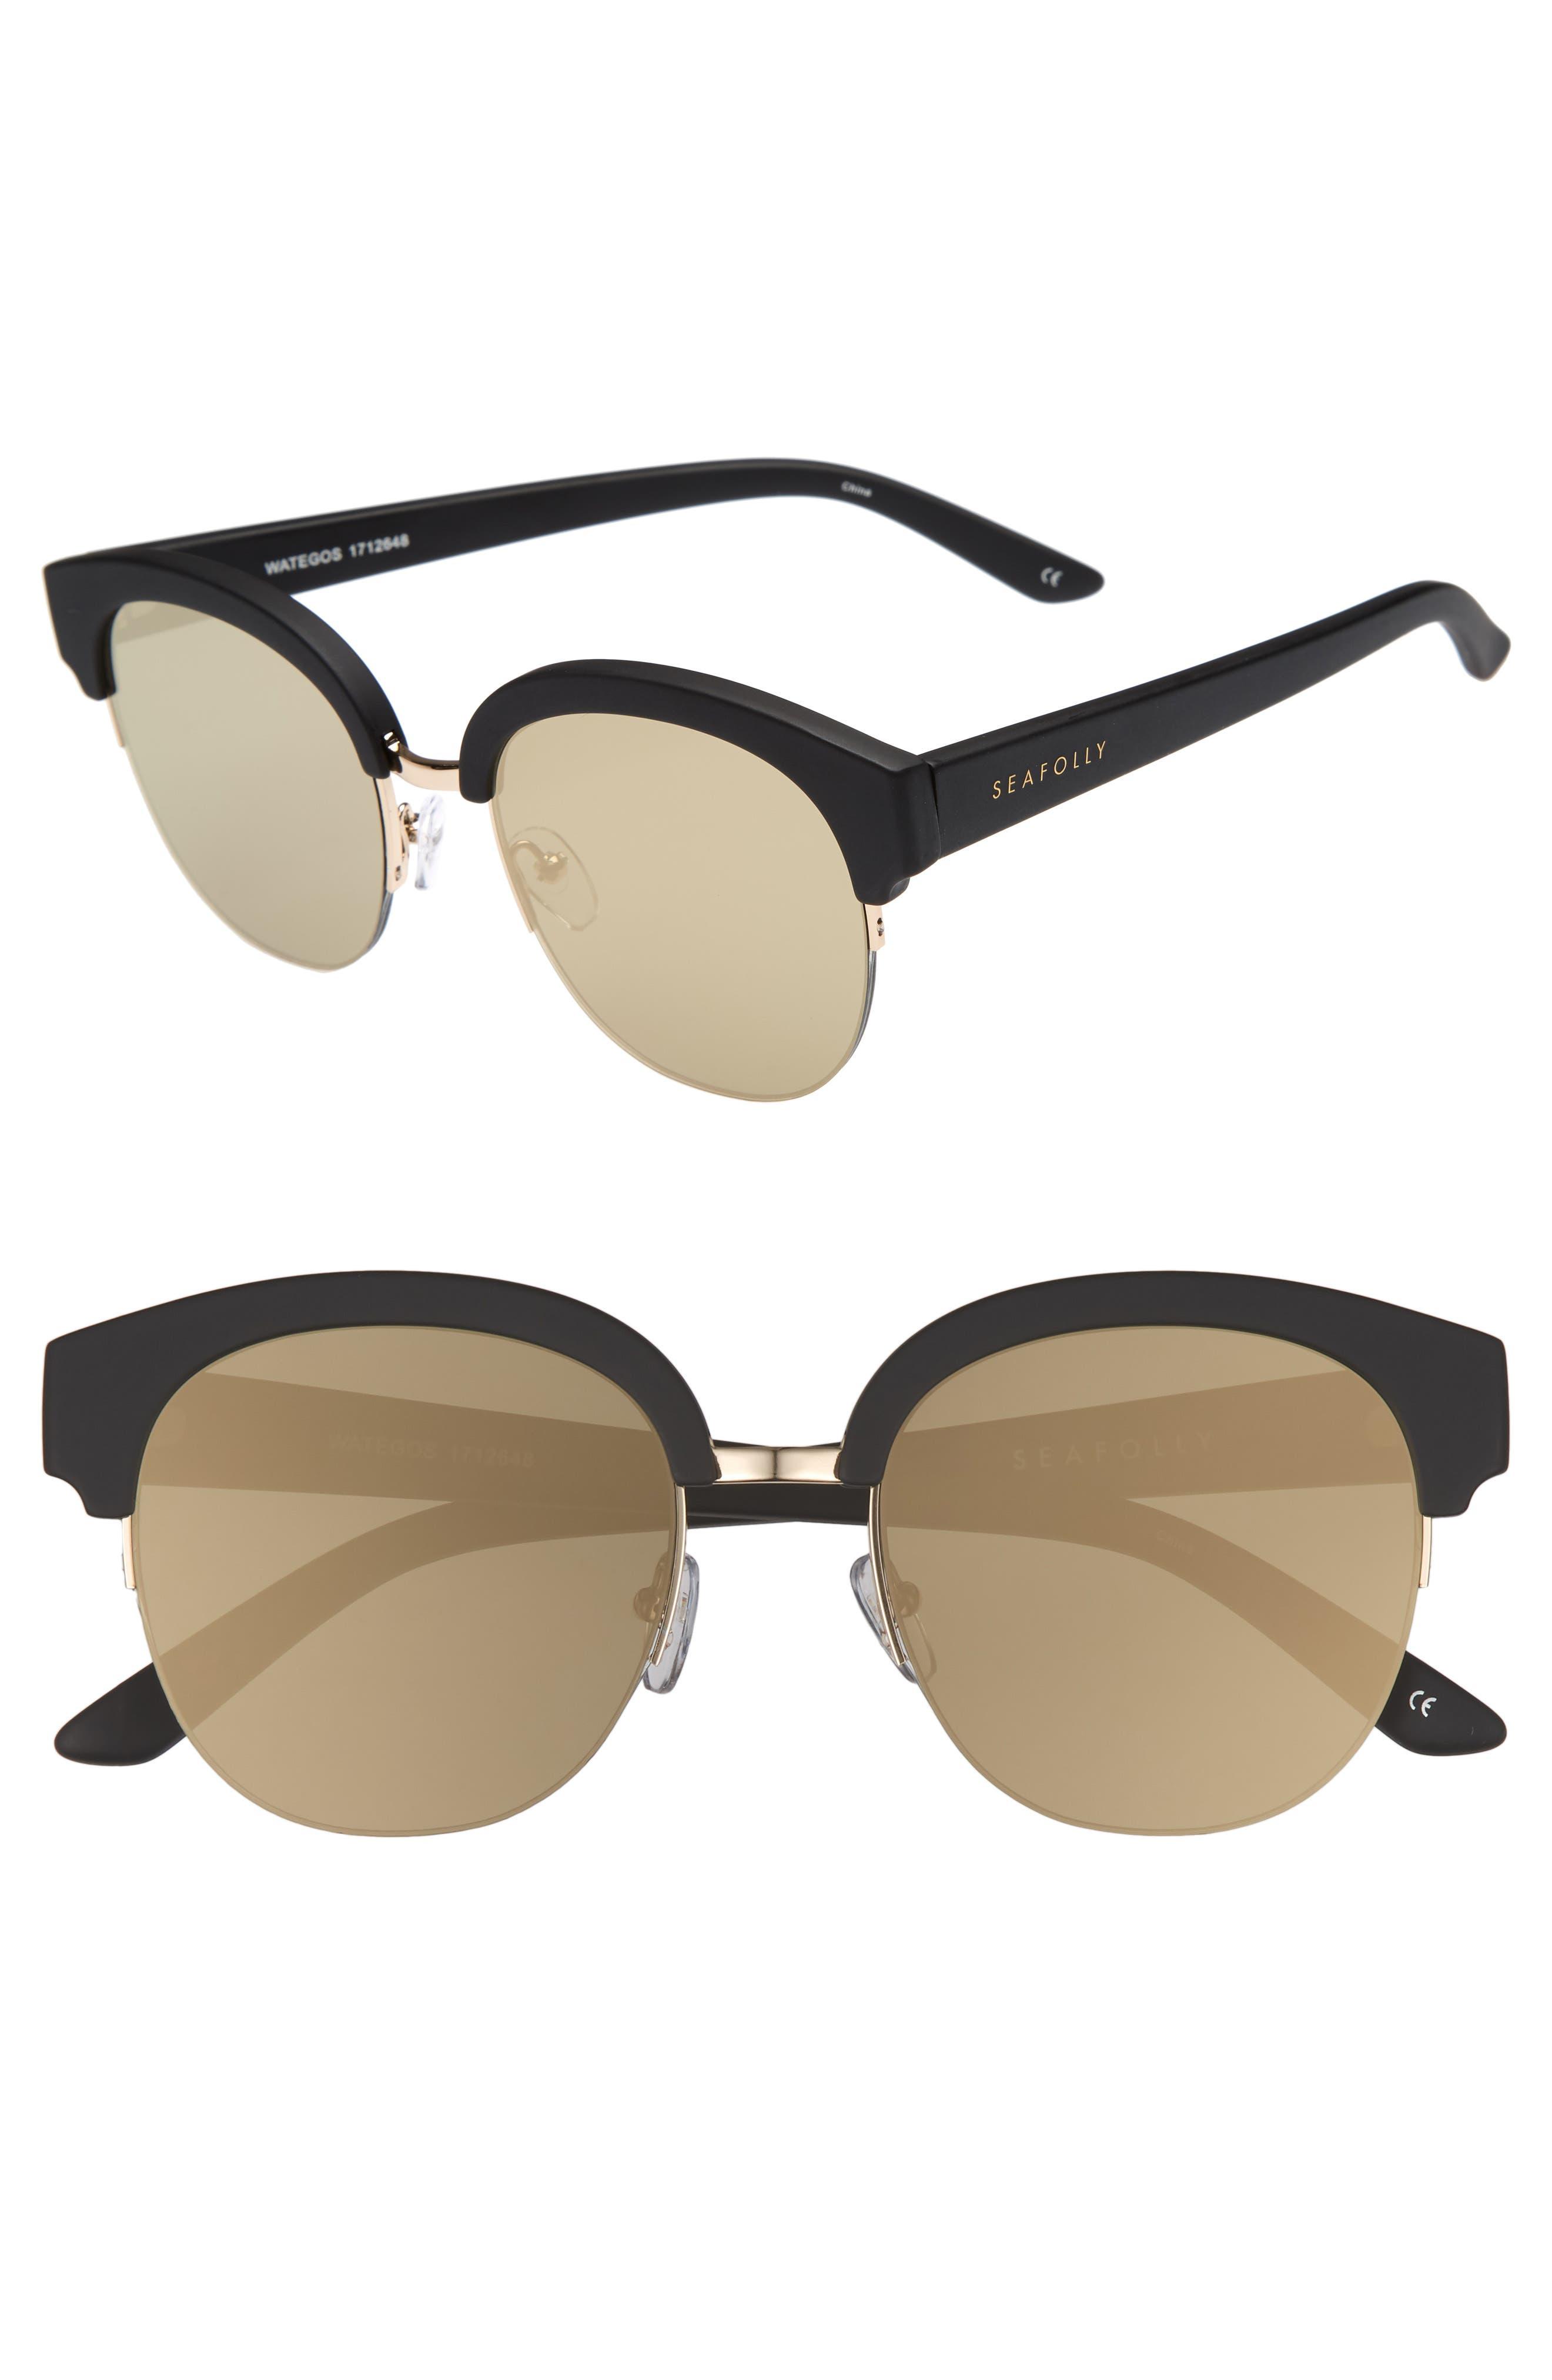 Seafolly Wategos 53mm Cat Eye Sunglasses